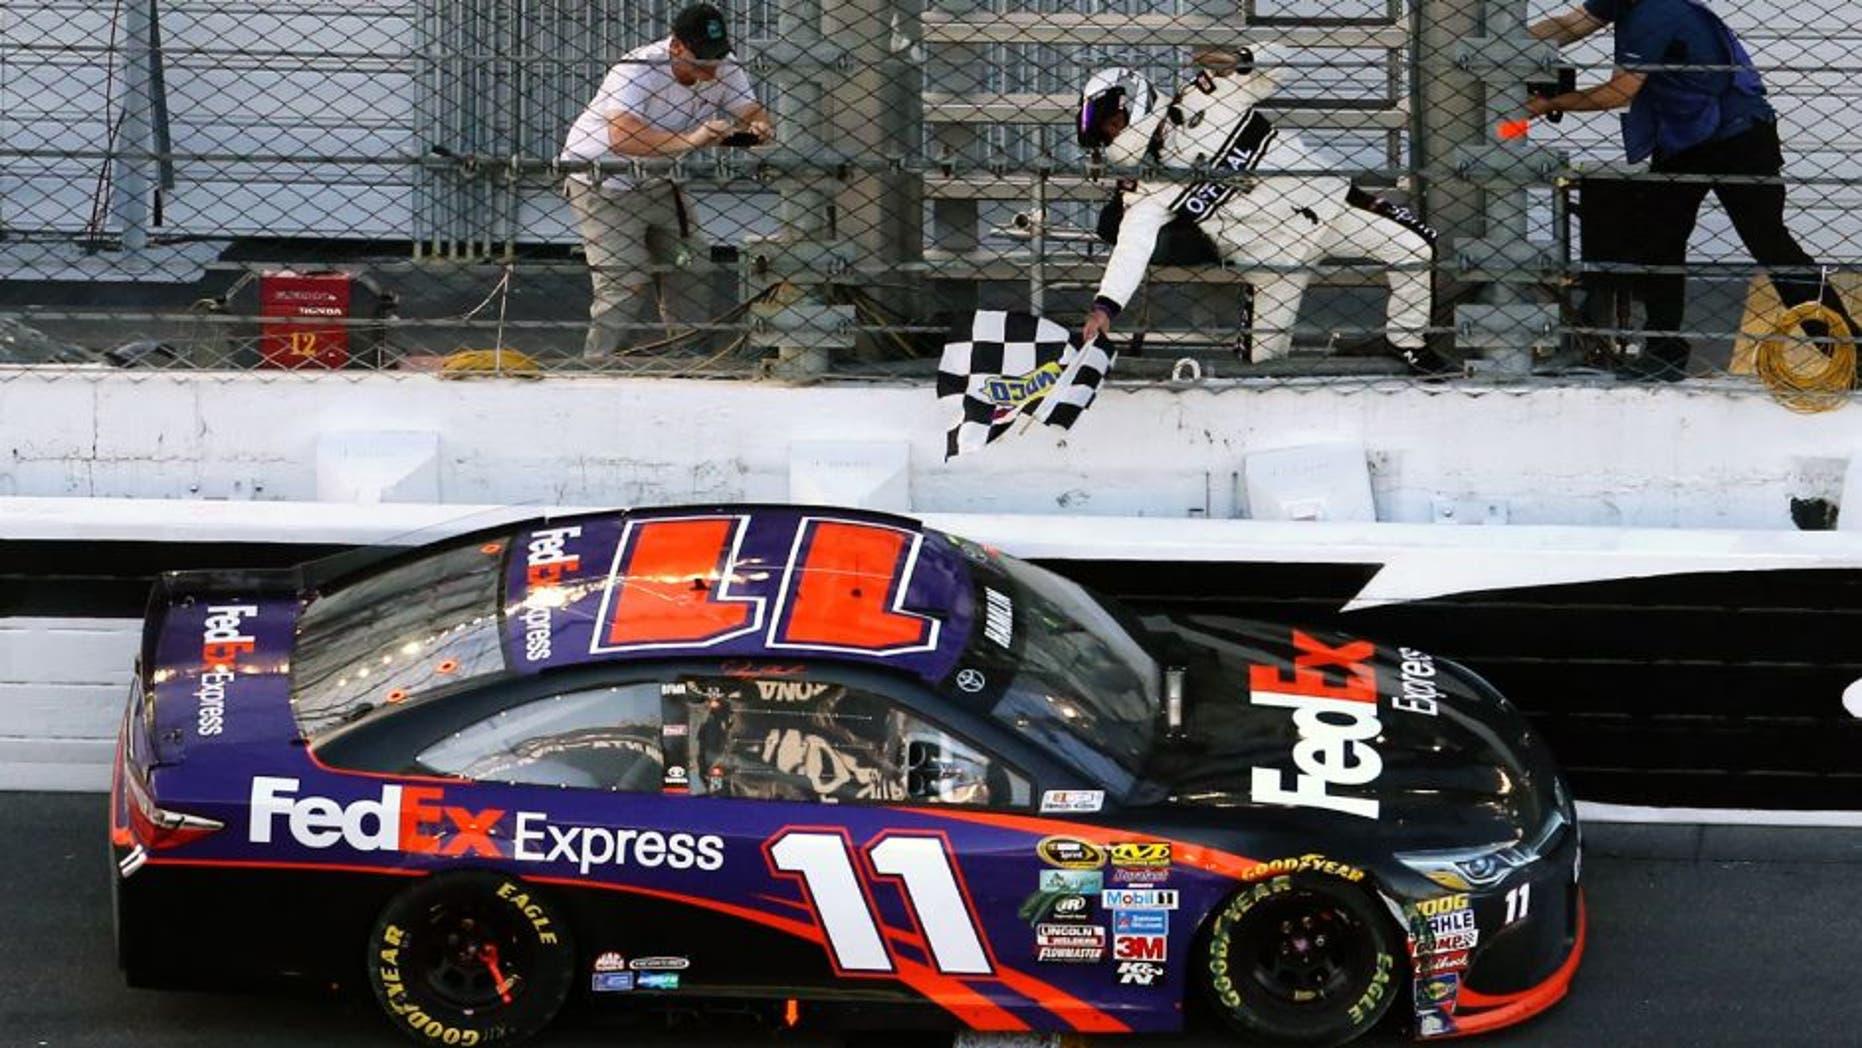 Danny Hamlin picks up the checkered flag after winning the Daytona 500 at Daytona International Speedway in Daytona Beach, Fla., on Sunday, Feb. 21, 2016. (Joe Burbank/Orlando Sentinel/TNS via Getty Images)